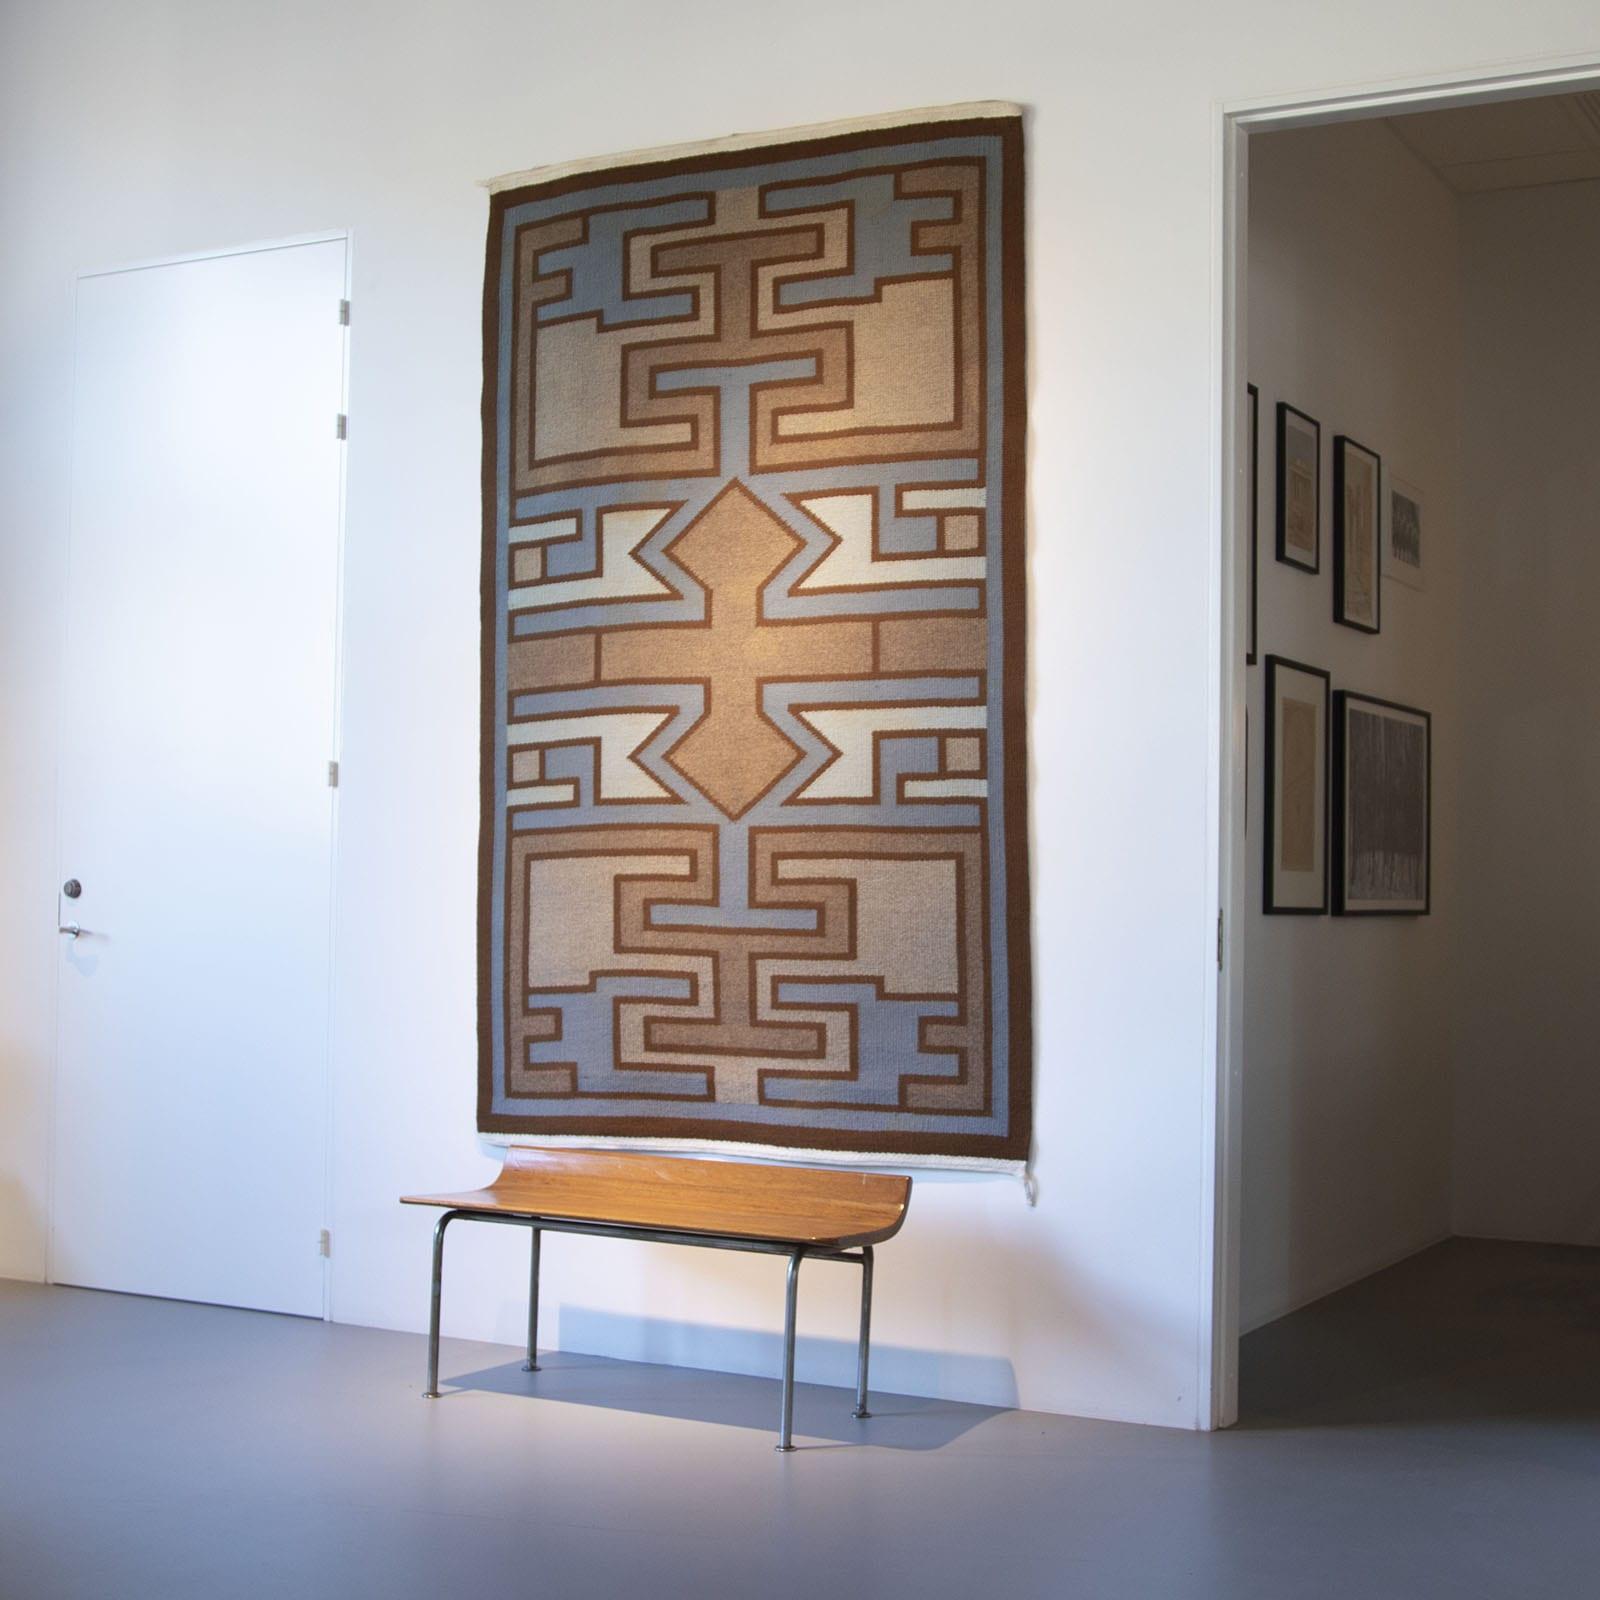 A geometric tapestry / rug